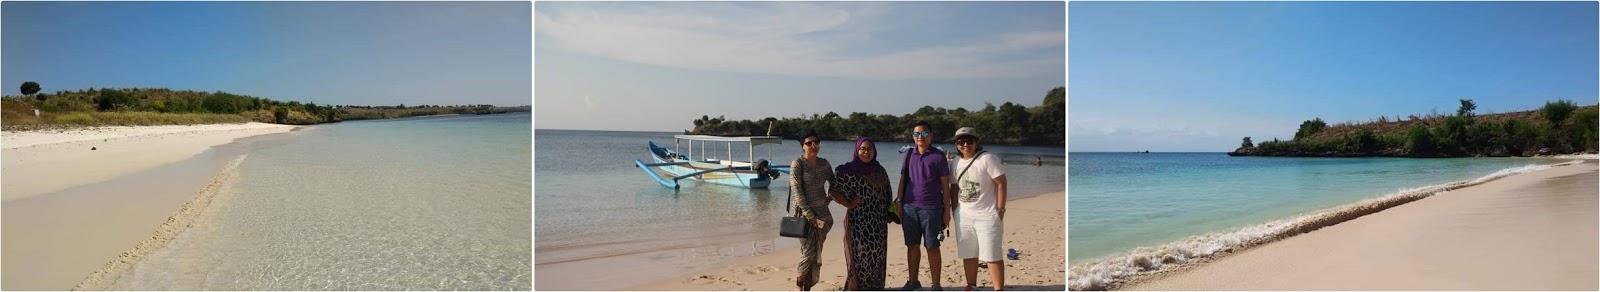 Trip ke Pantai Pink Lombok